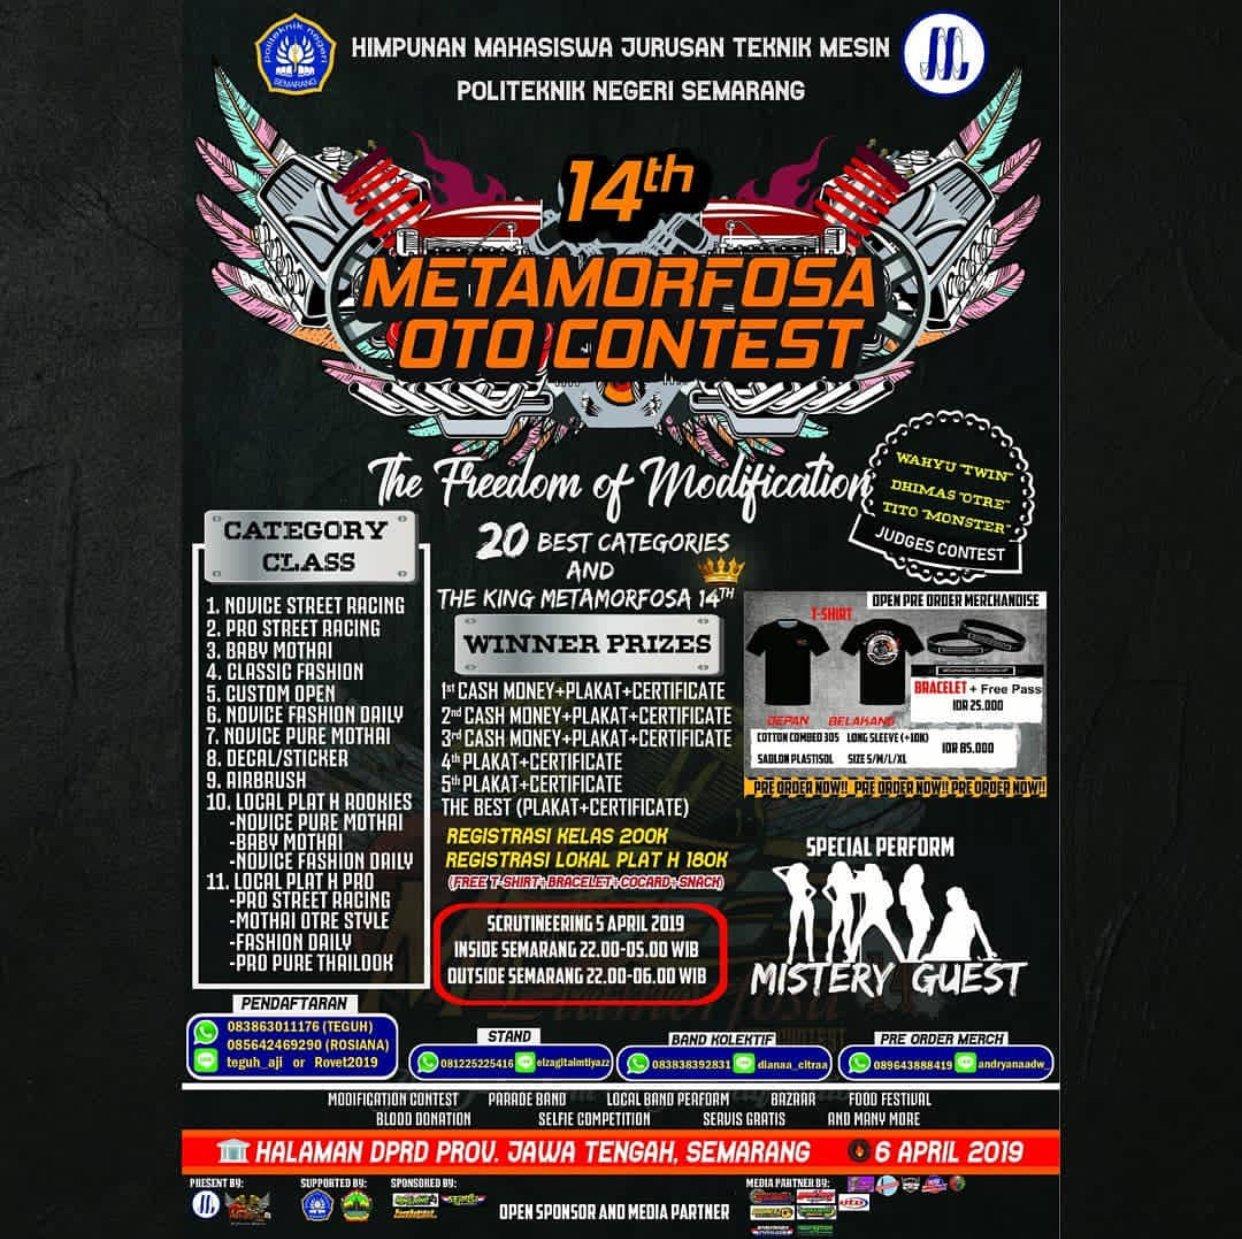 Event Semarang - Memorfosa Oto Contest 14th